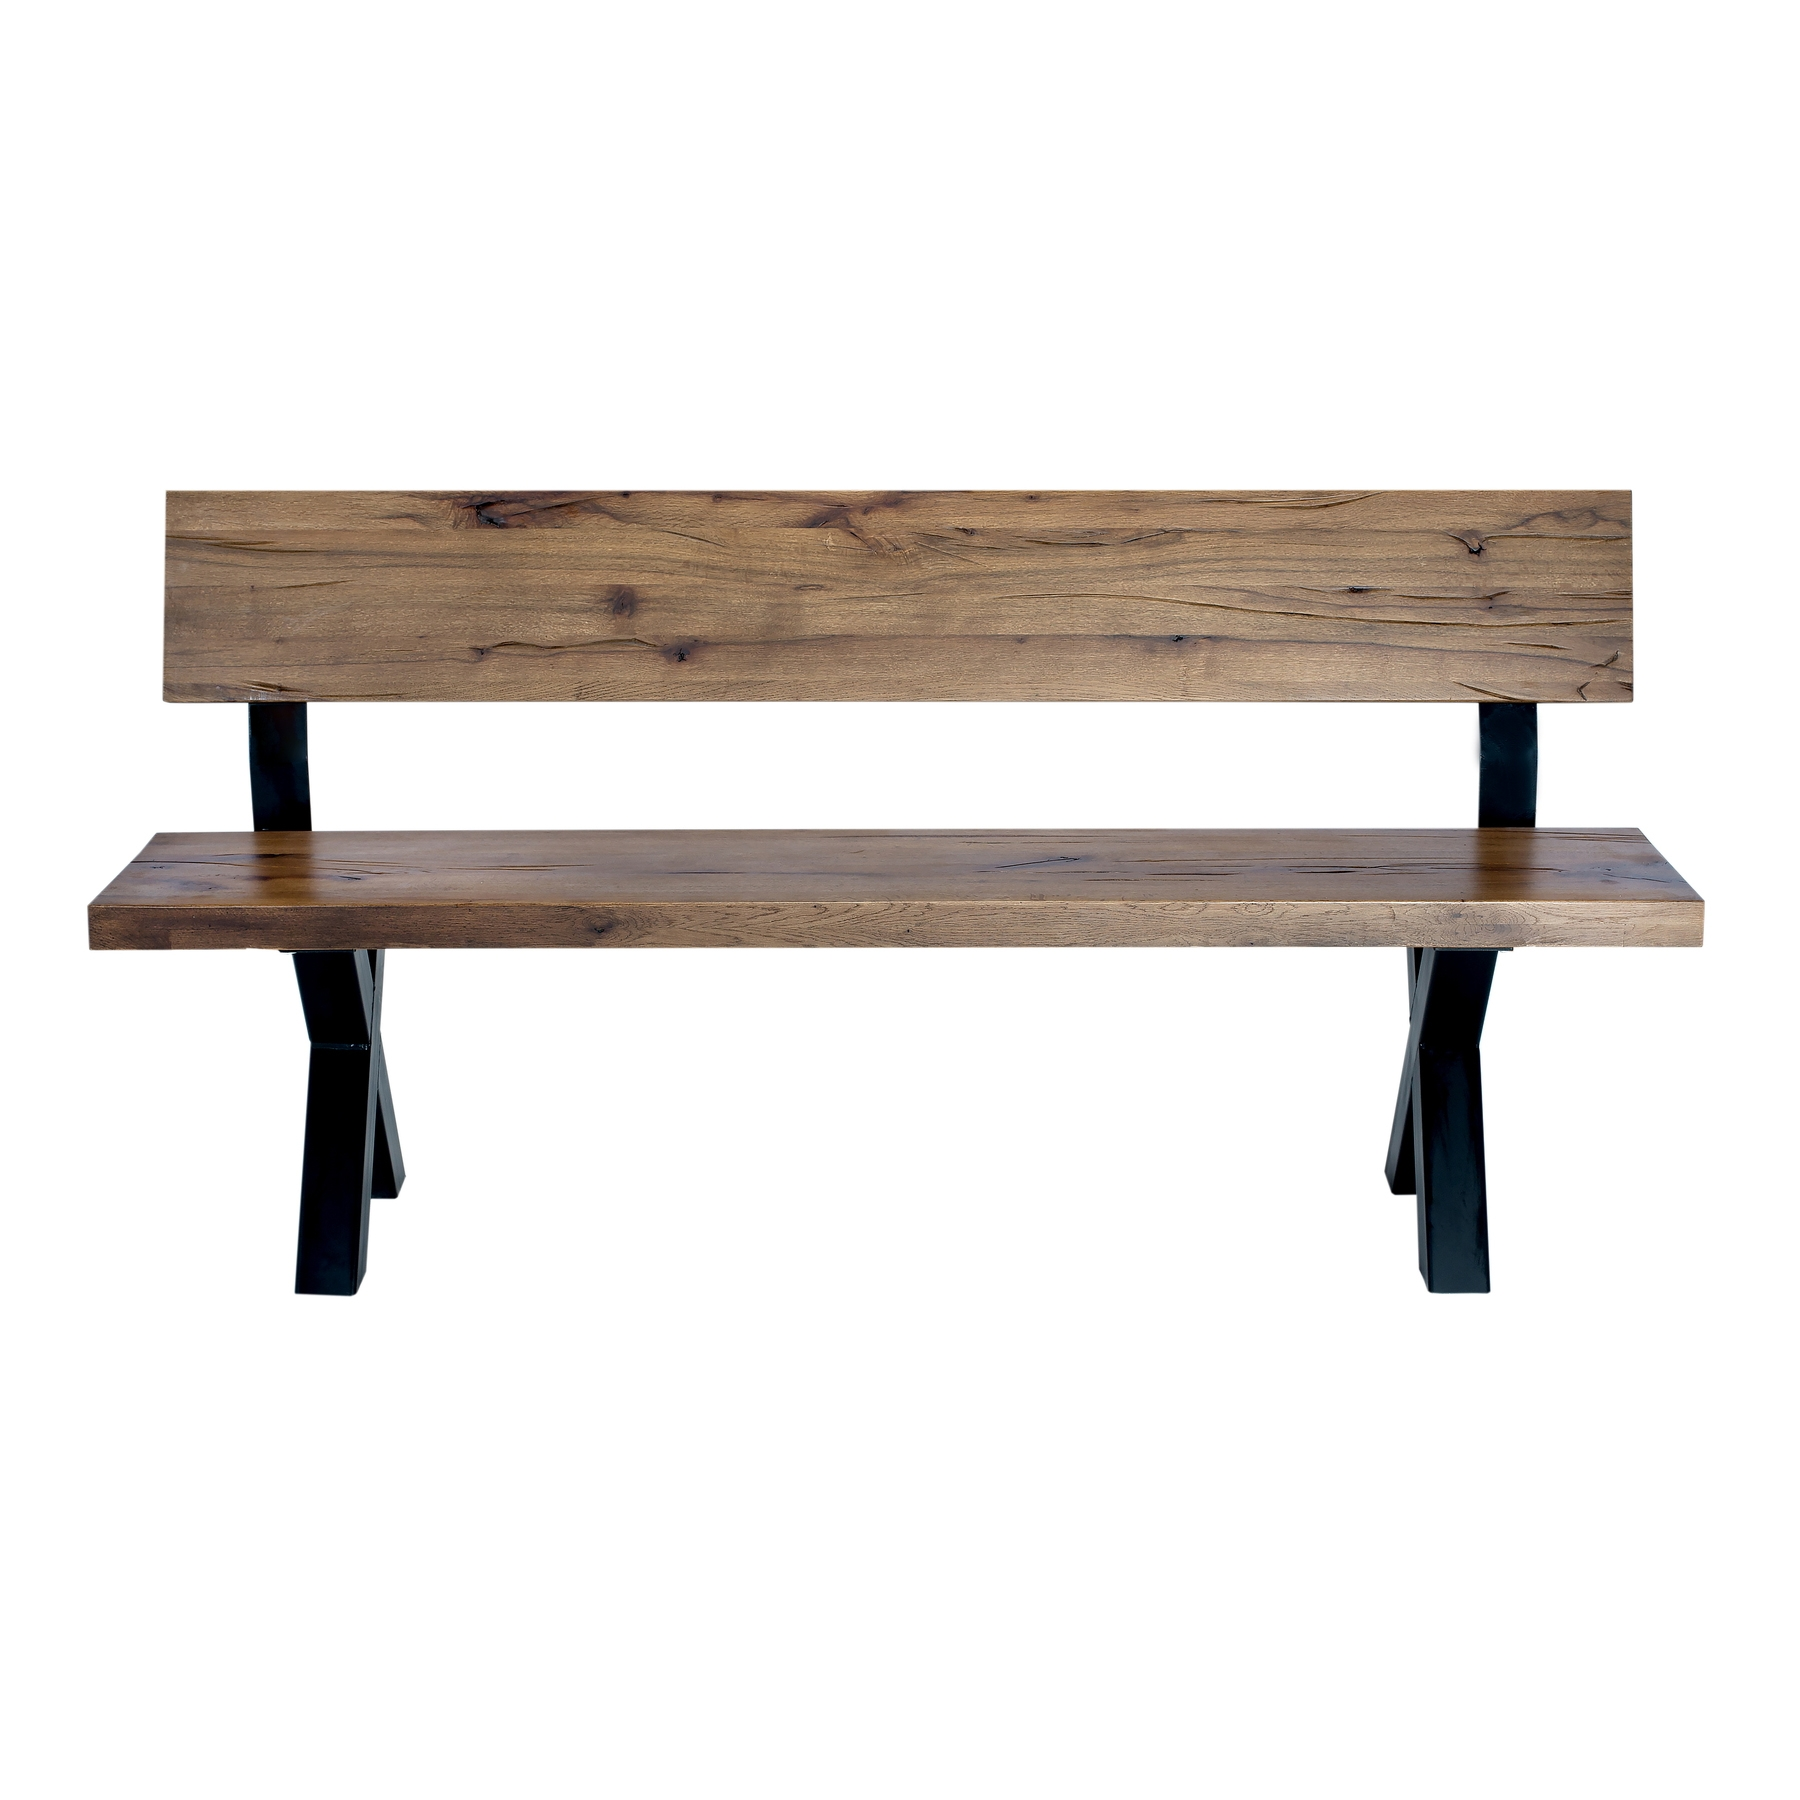 Banca din lemn de stejar salbatic cu picioare metalice Atena l200xA40xH75 cm